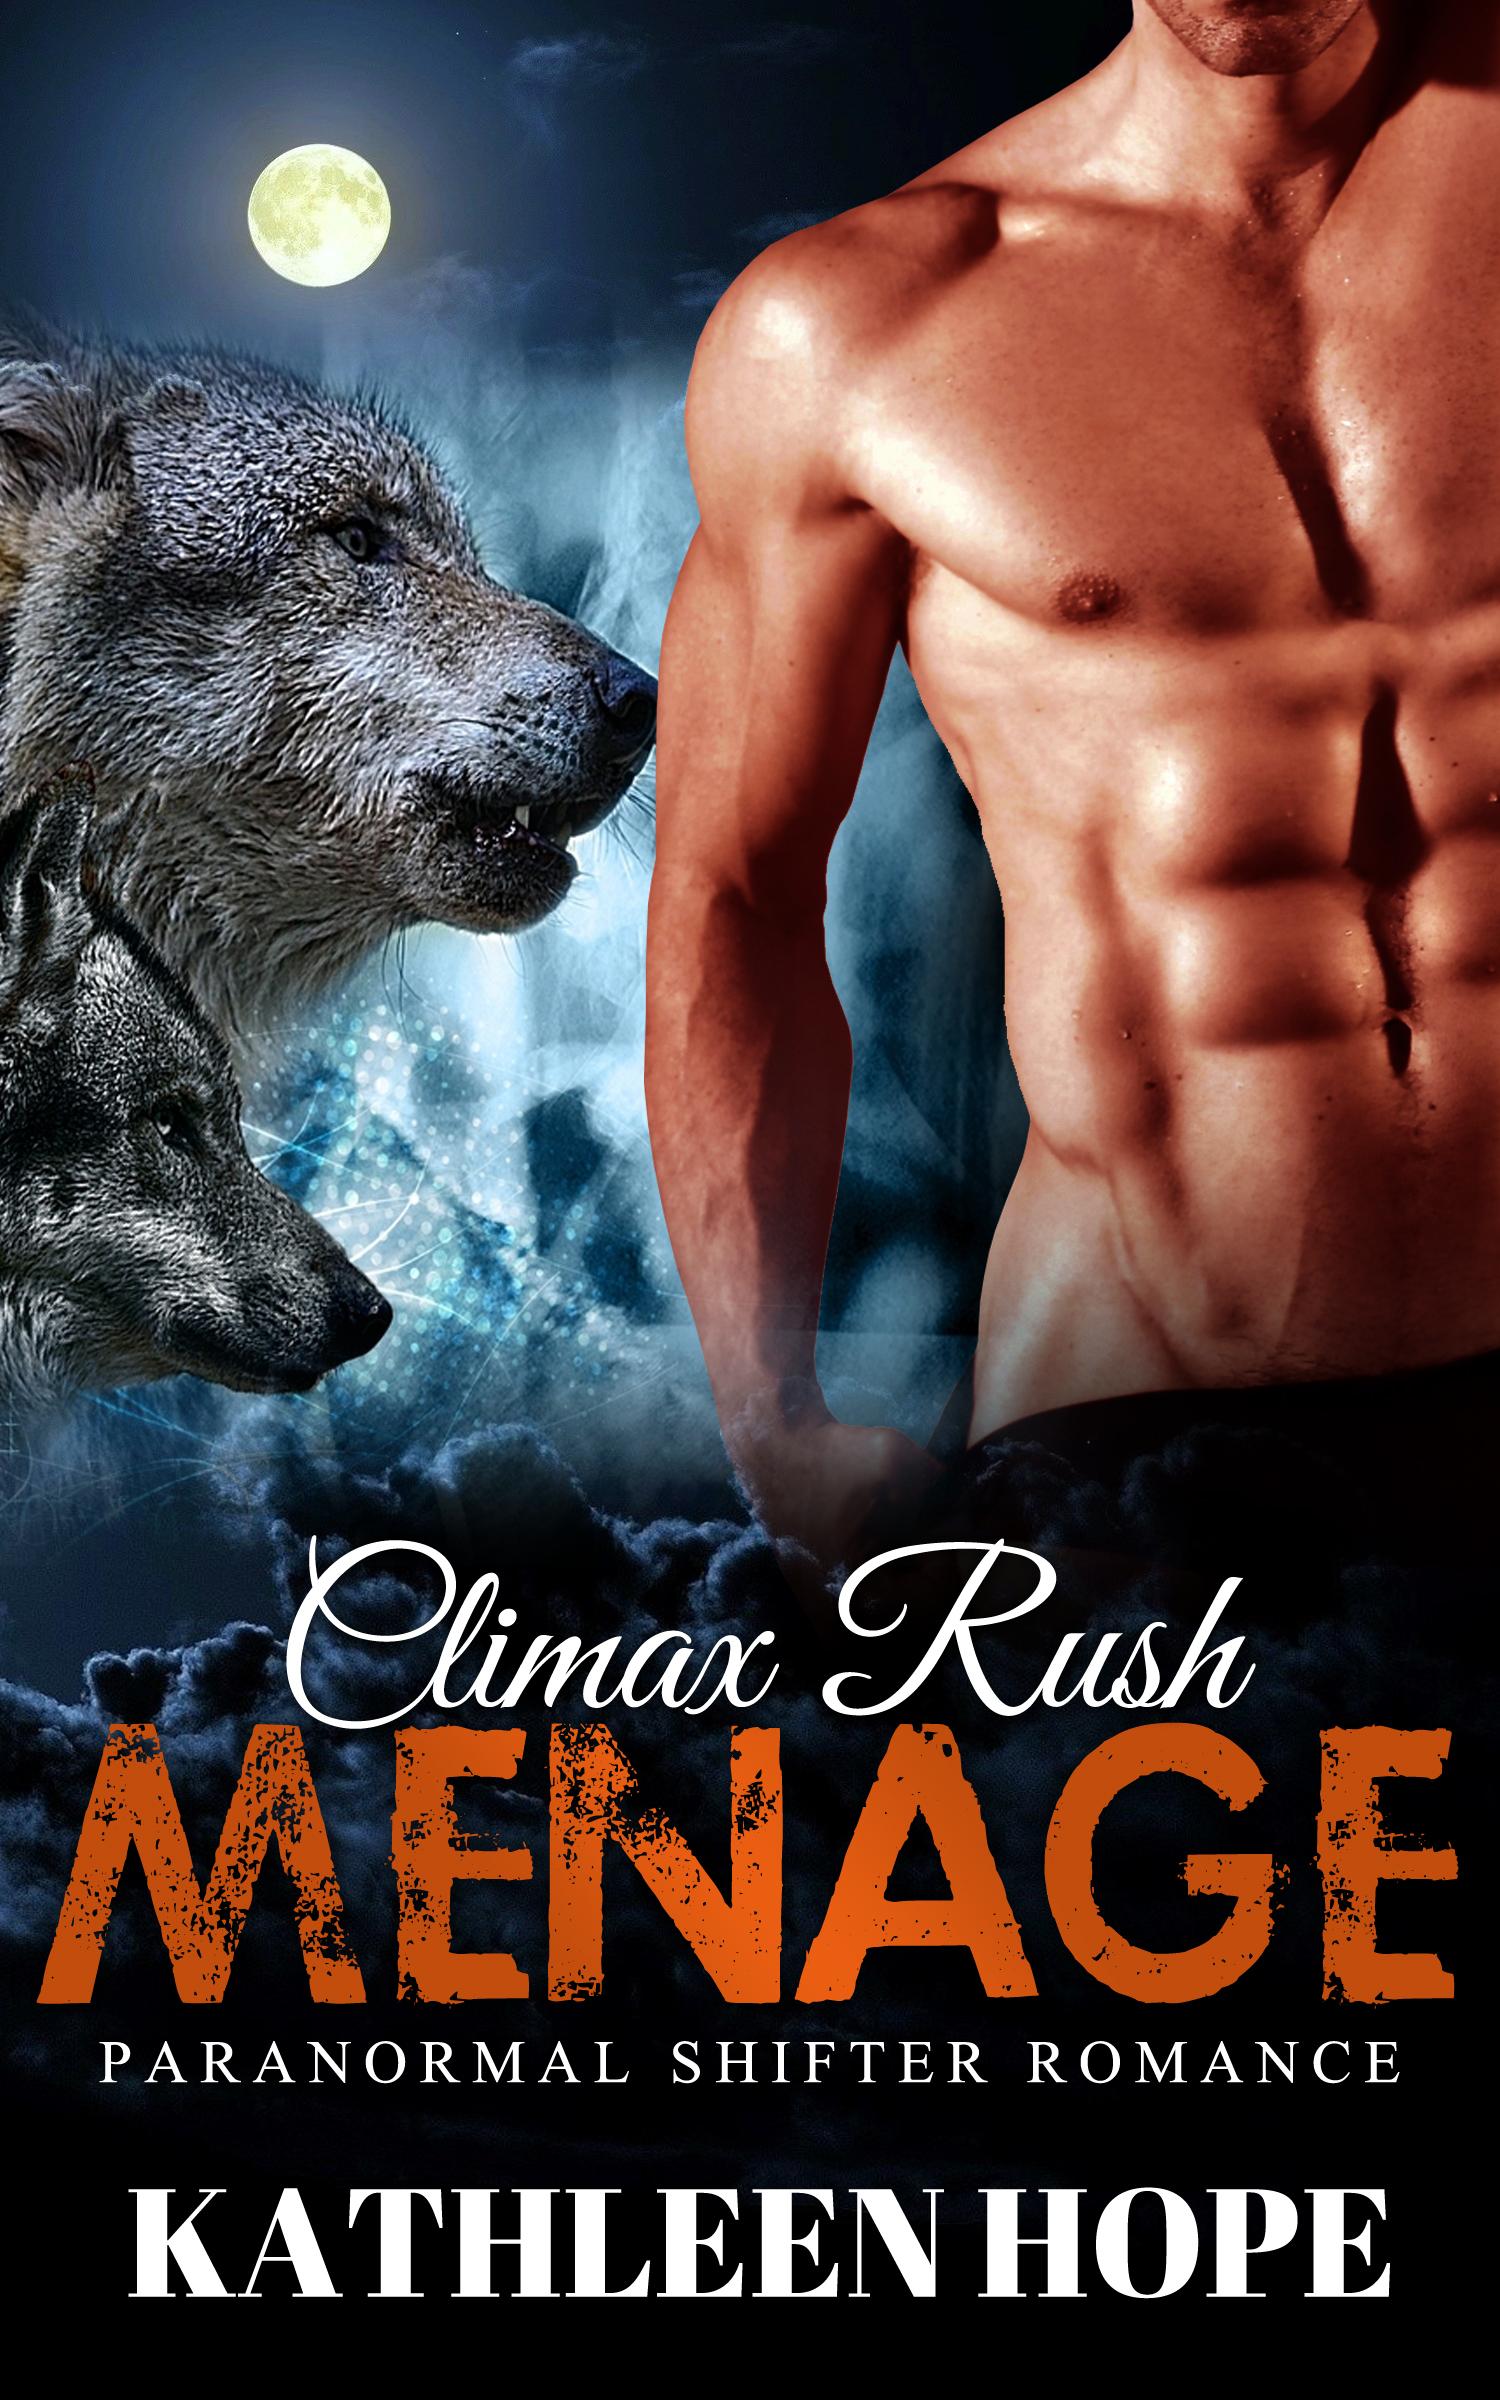 Menage: climax rush